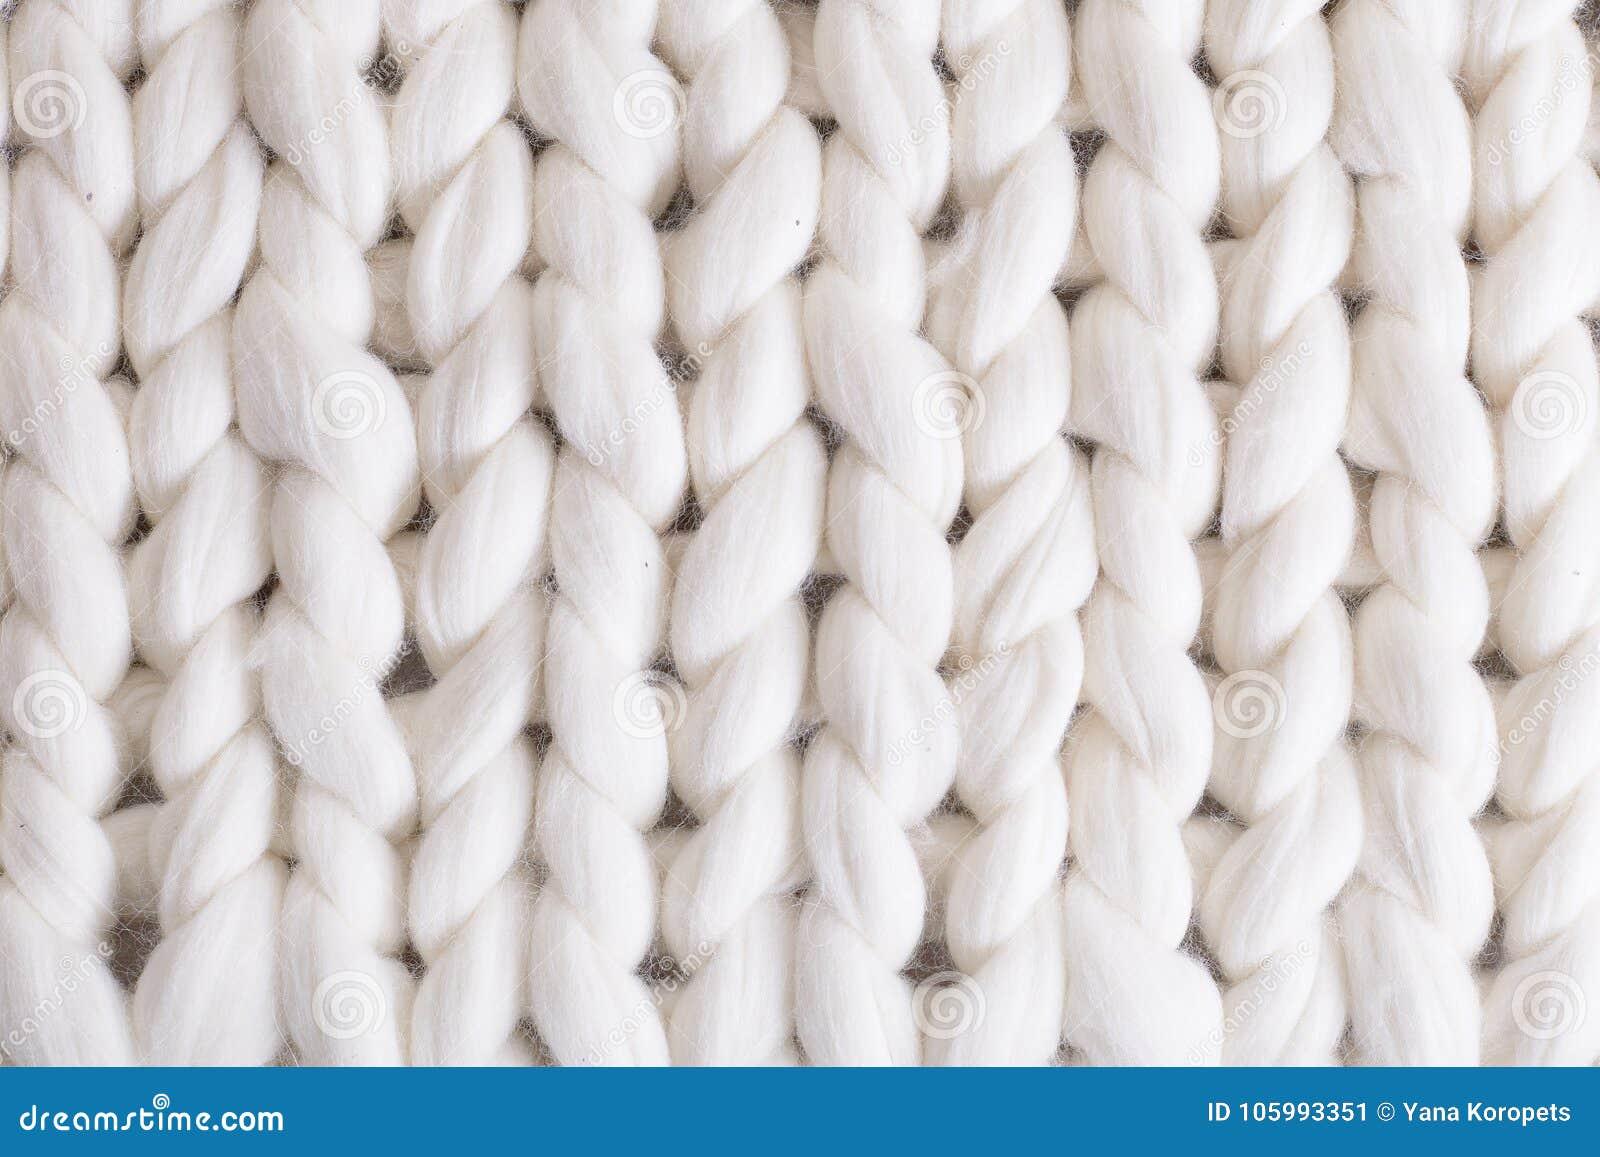 De witte grote plaid breit textuurvlecht gebreide deken